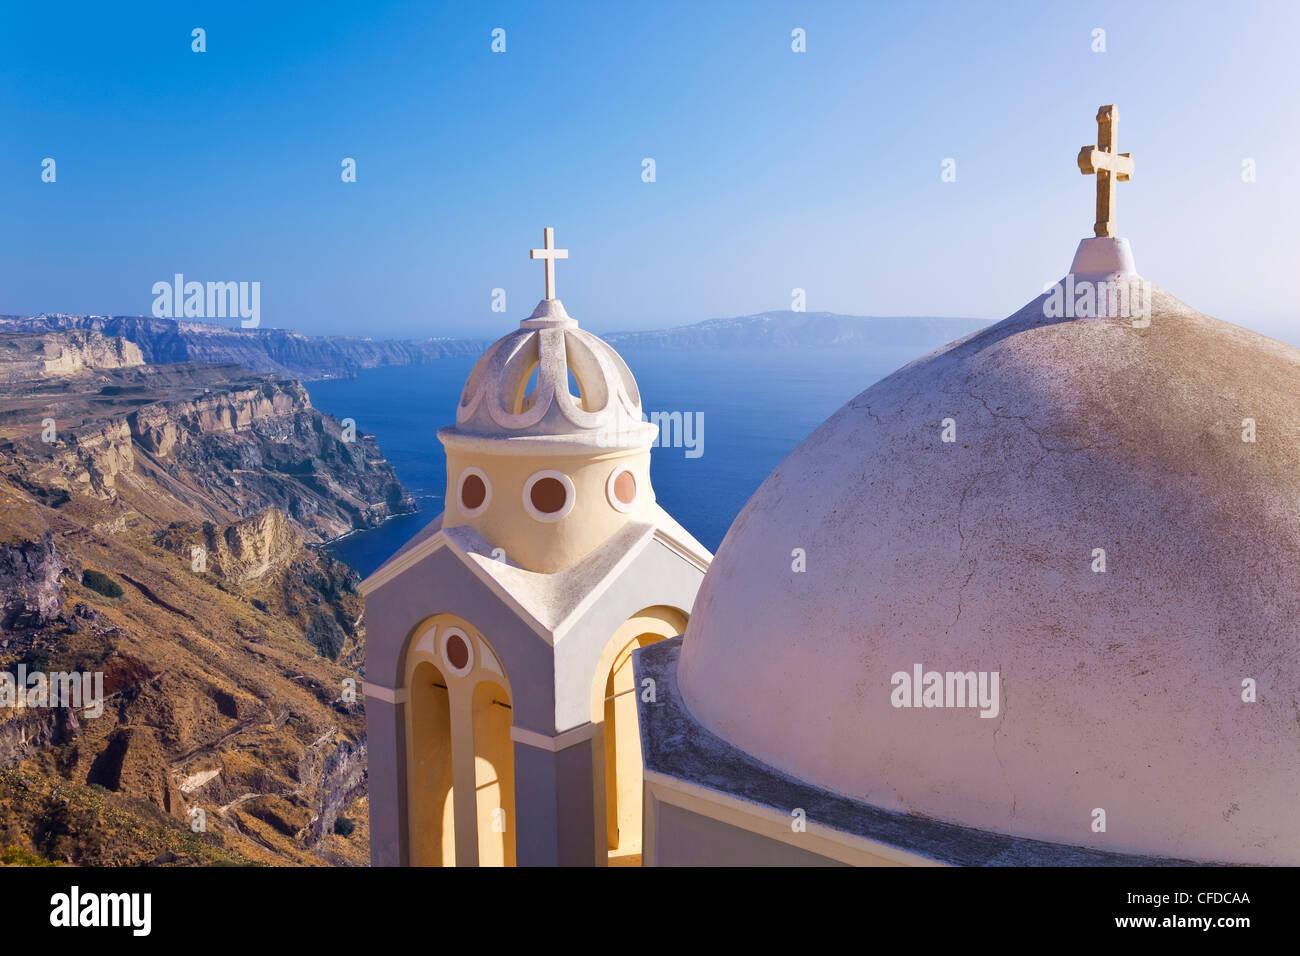 Greek Orthodox Church in Fira, Santorini (Thira), Cyclades Islands, Aegean Sea, Greek Islands, Greece, Europe - Stock Image